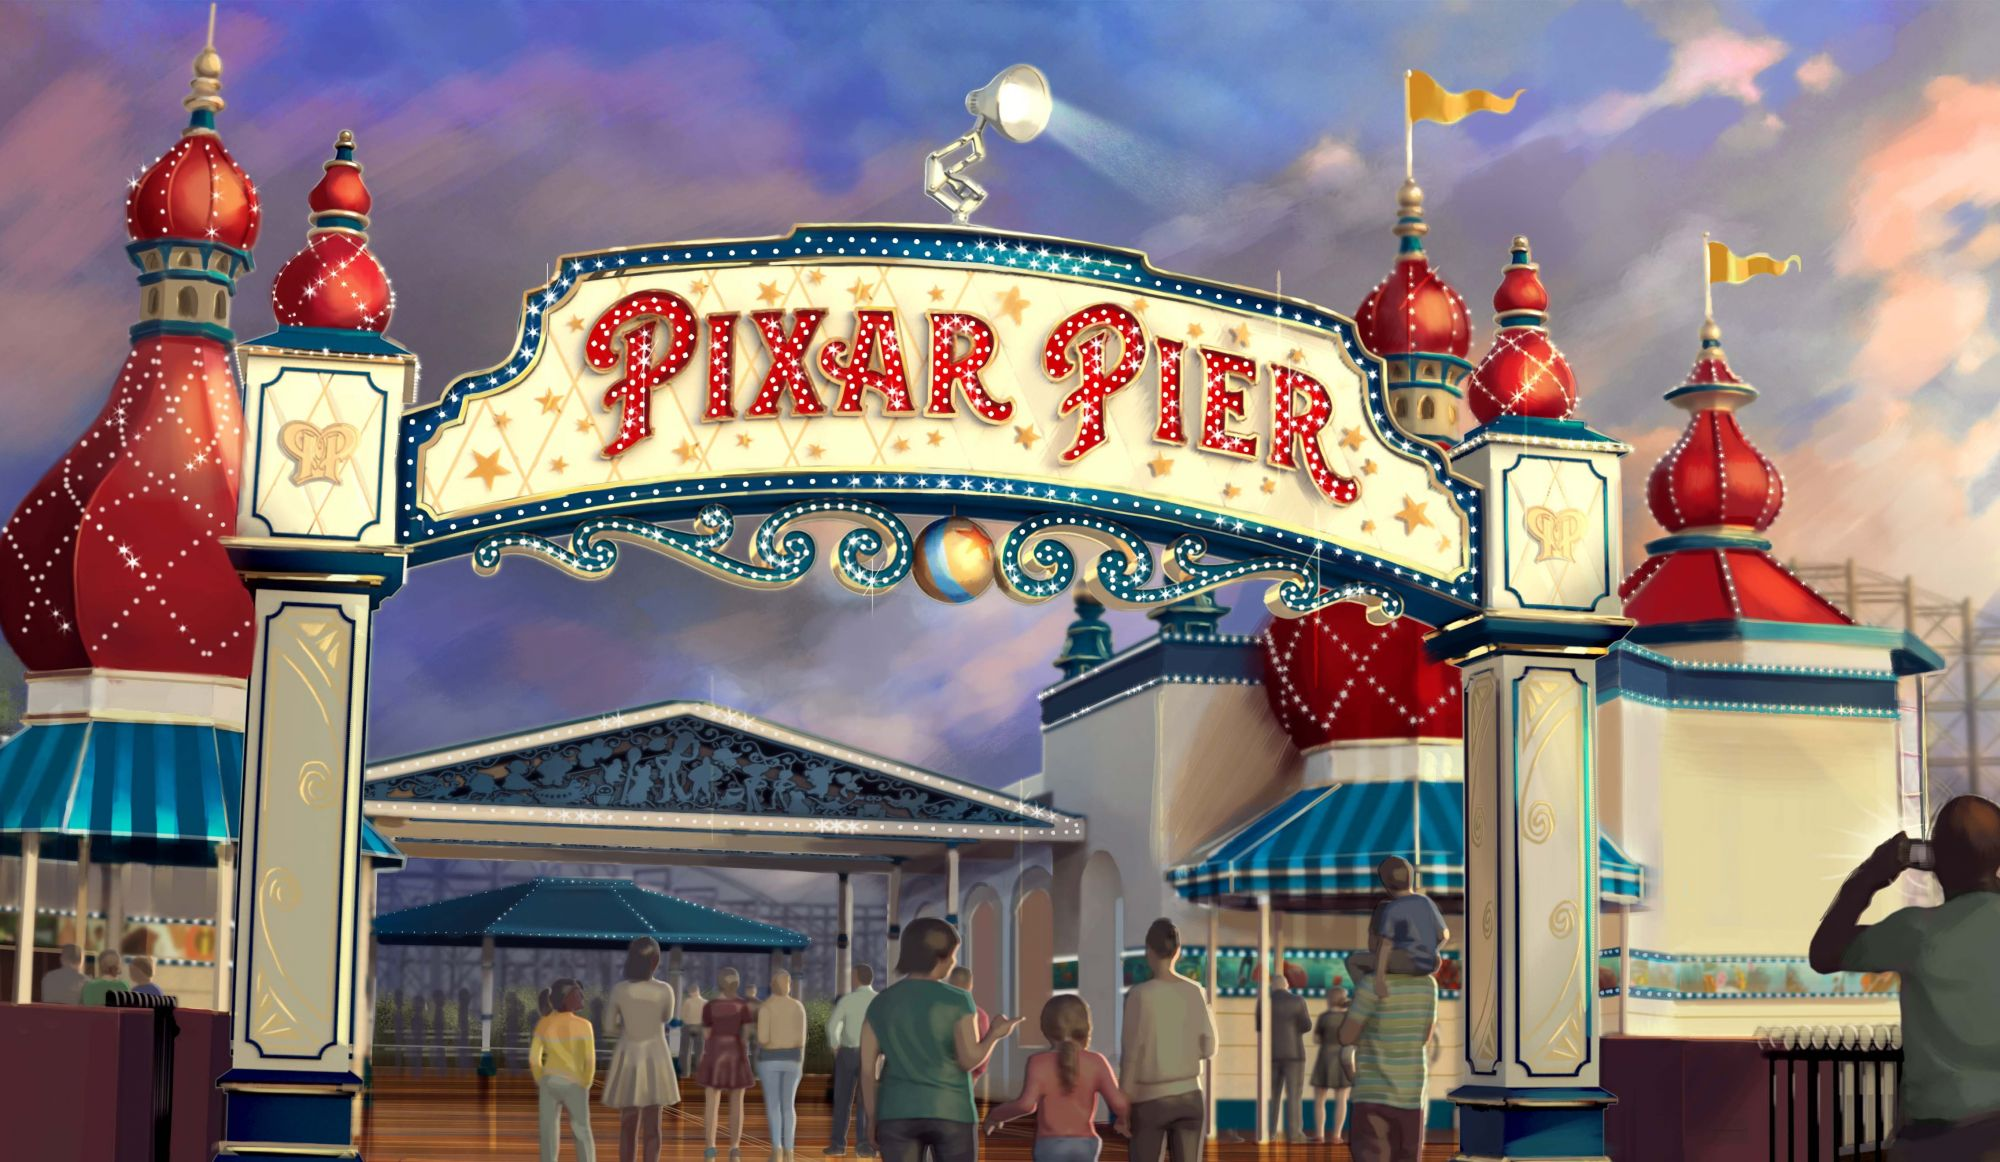 Les prochaines attractions de Disney